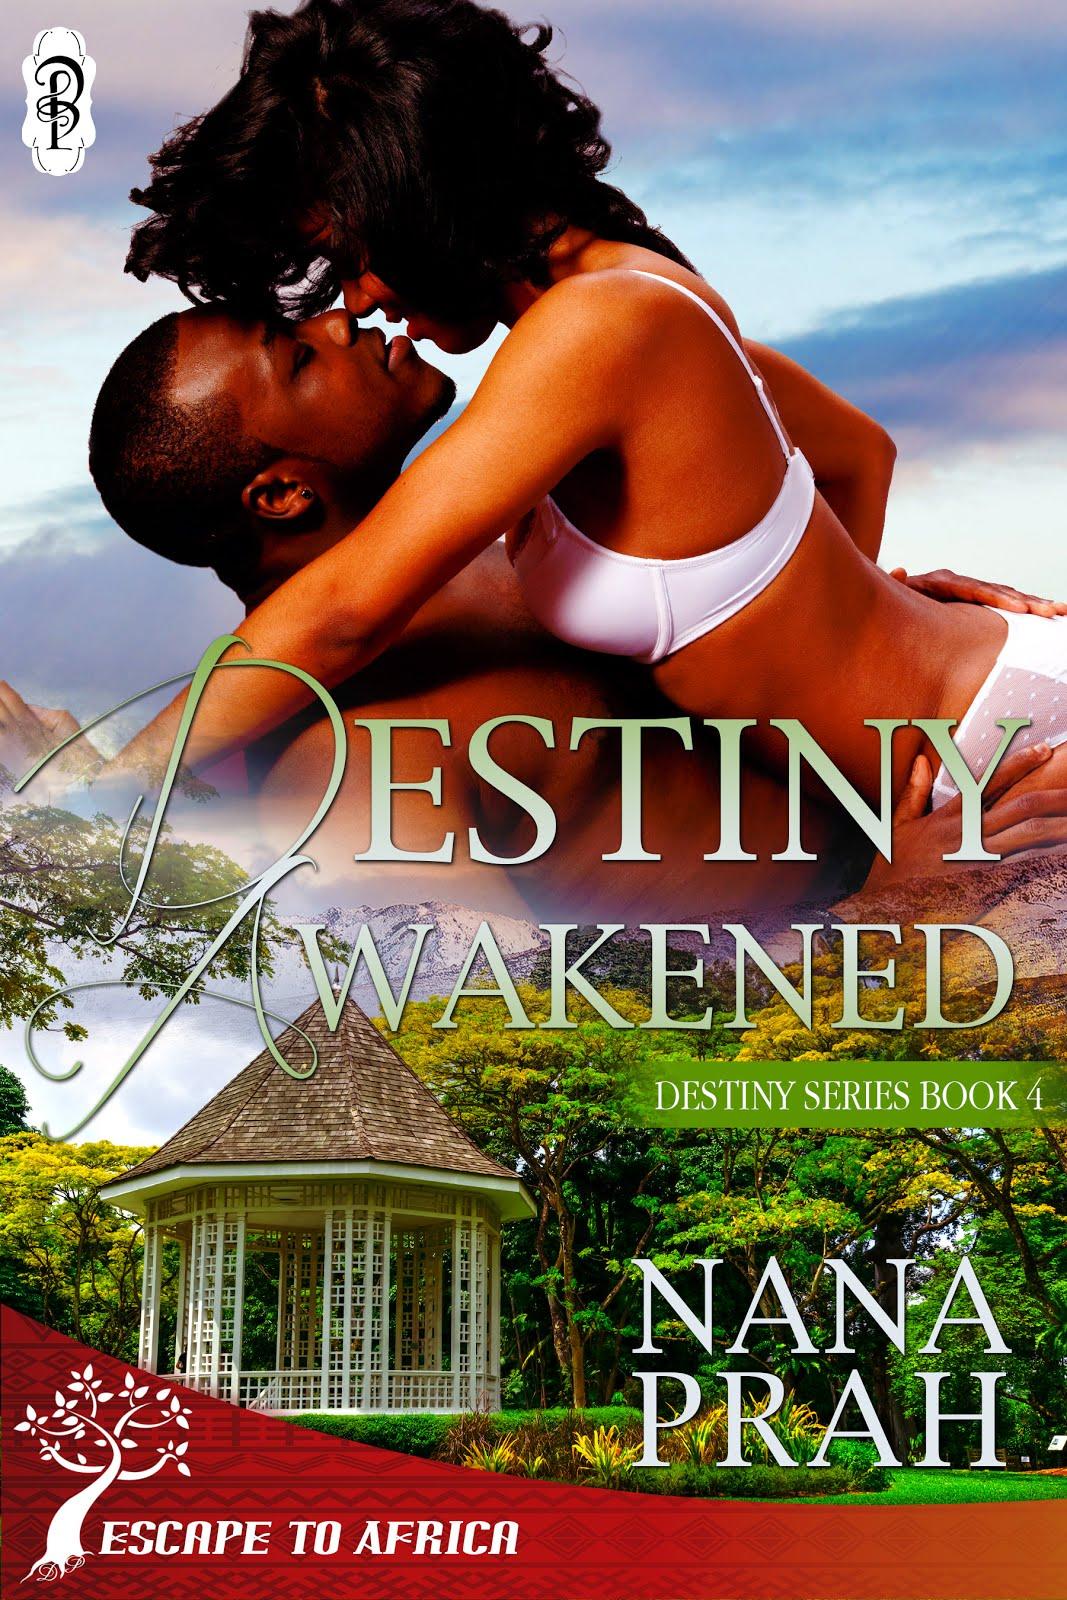 Destiny Awakened by Nana Prah